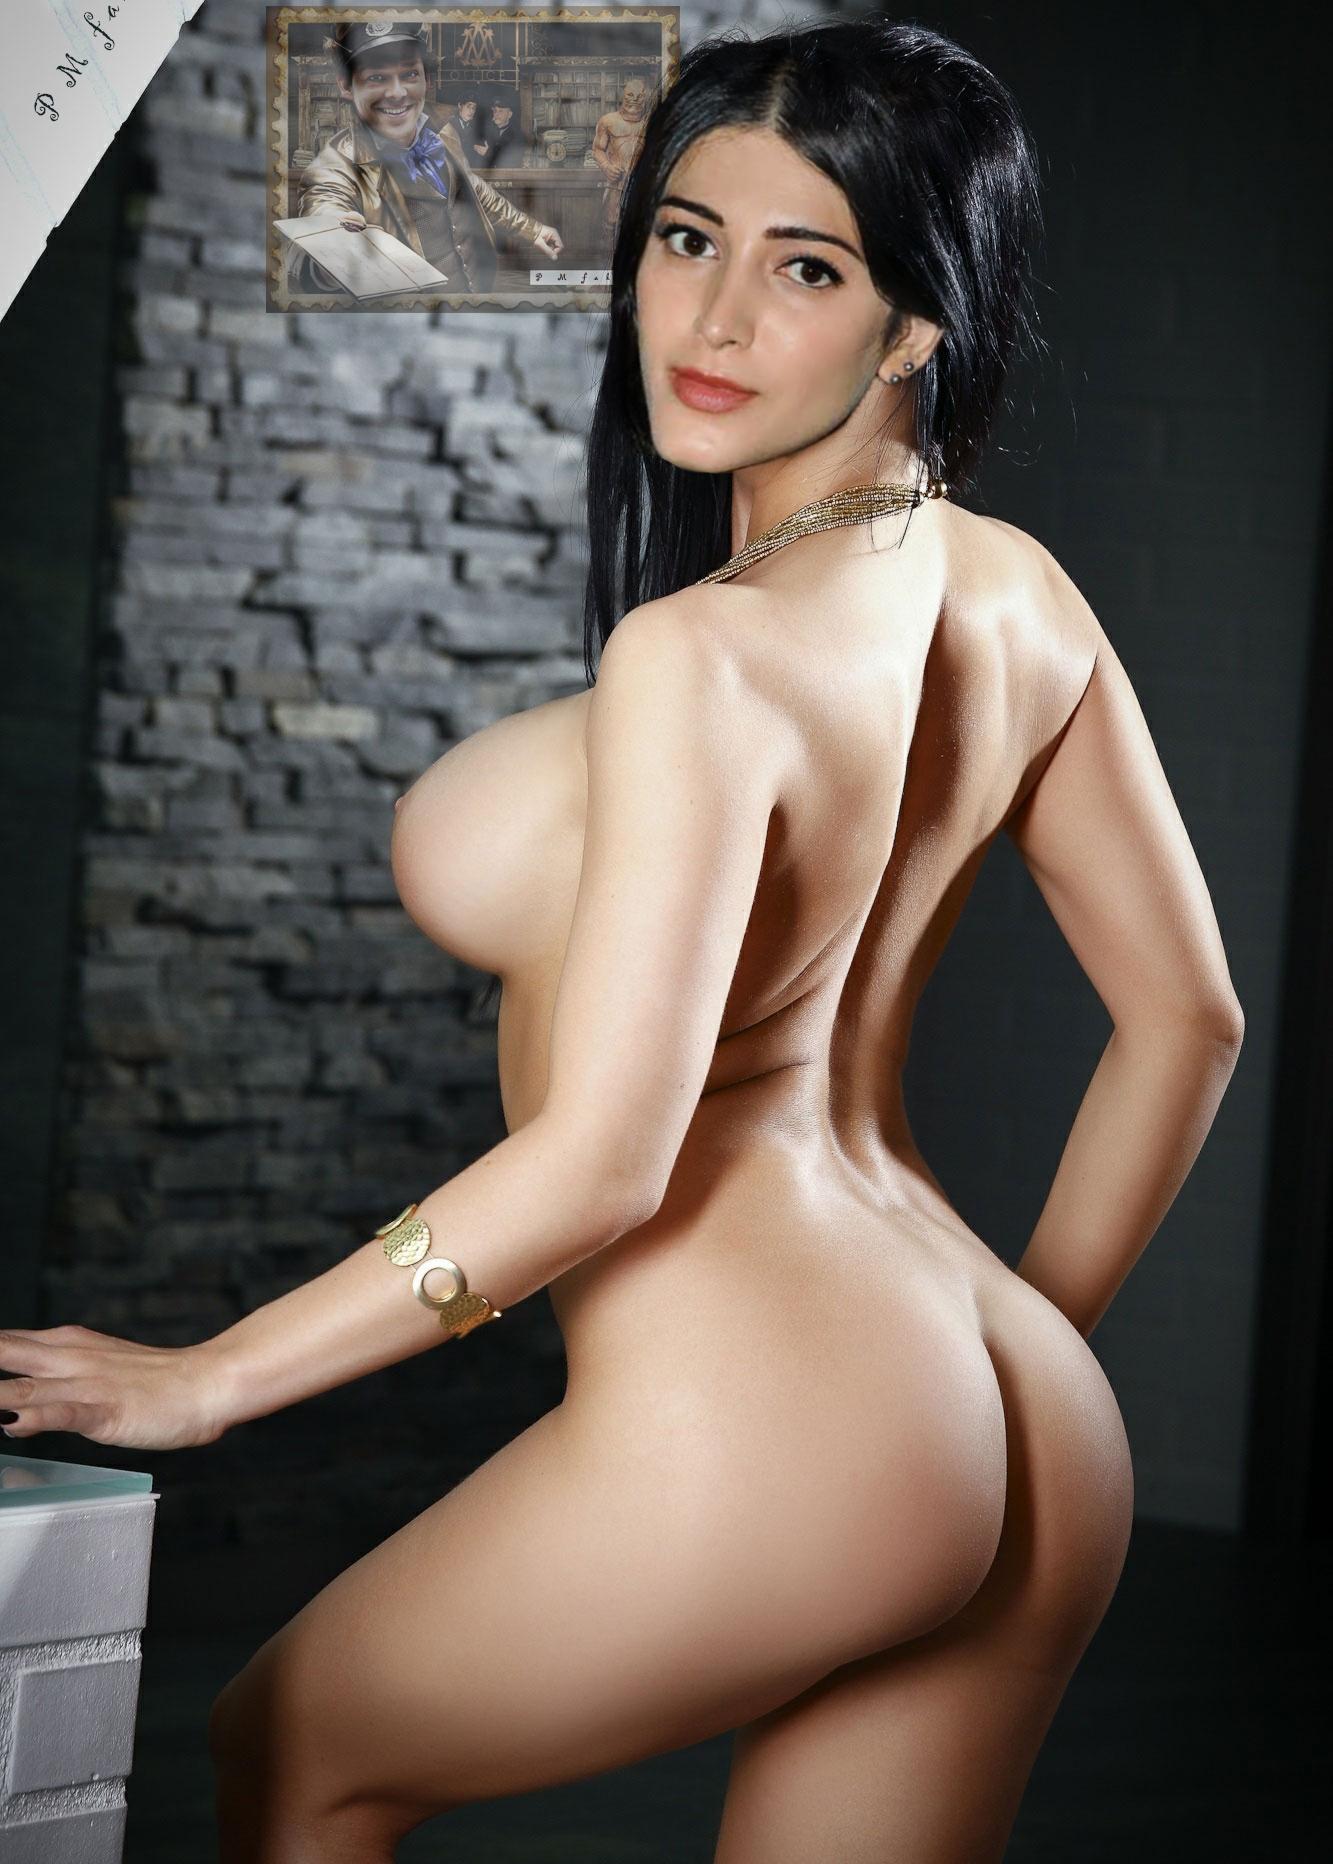 Shruti Hassan Nude Sex Images Text Angela Umeoakland